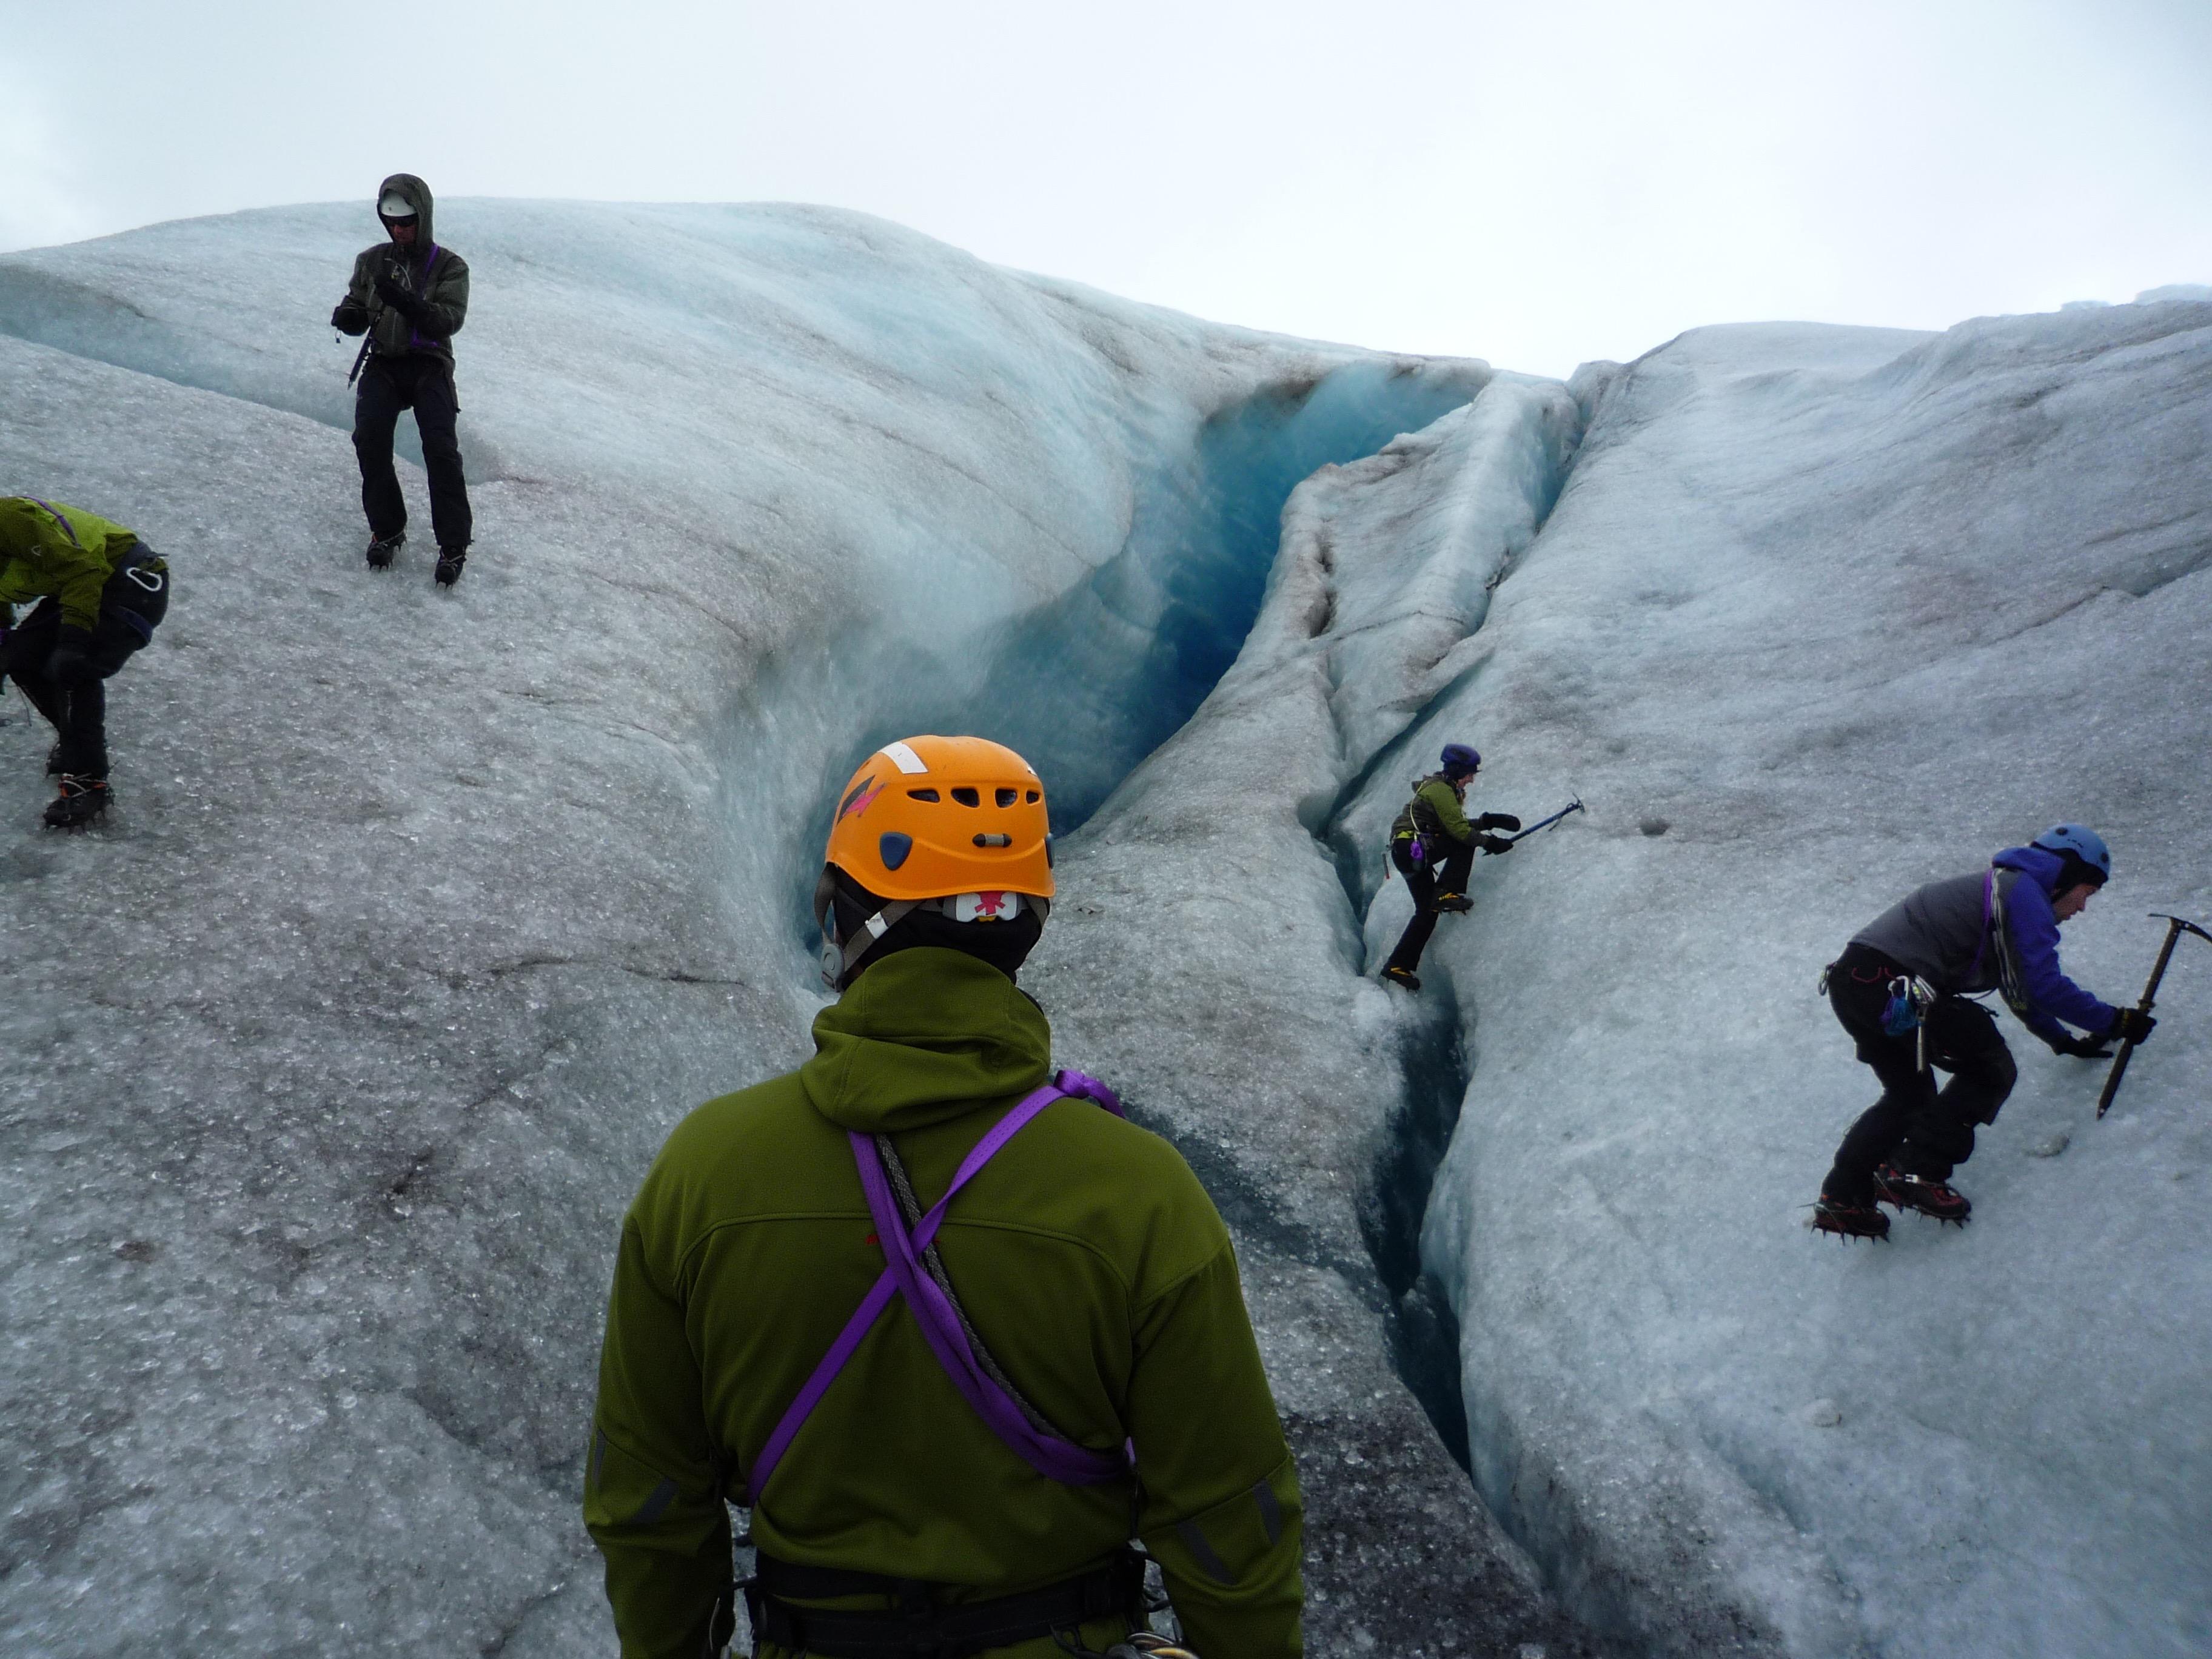 Glacier - For Alpine Climbers